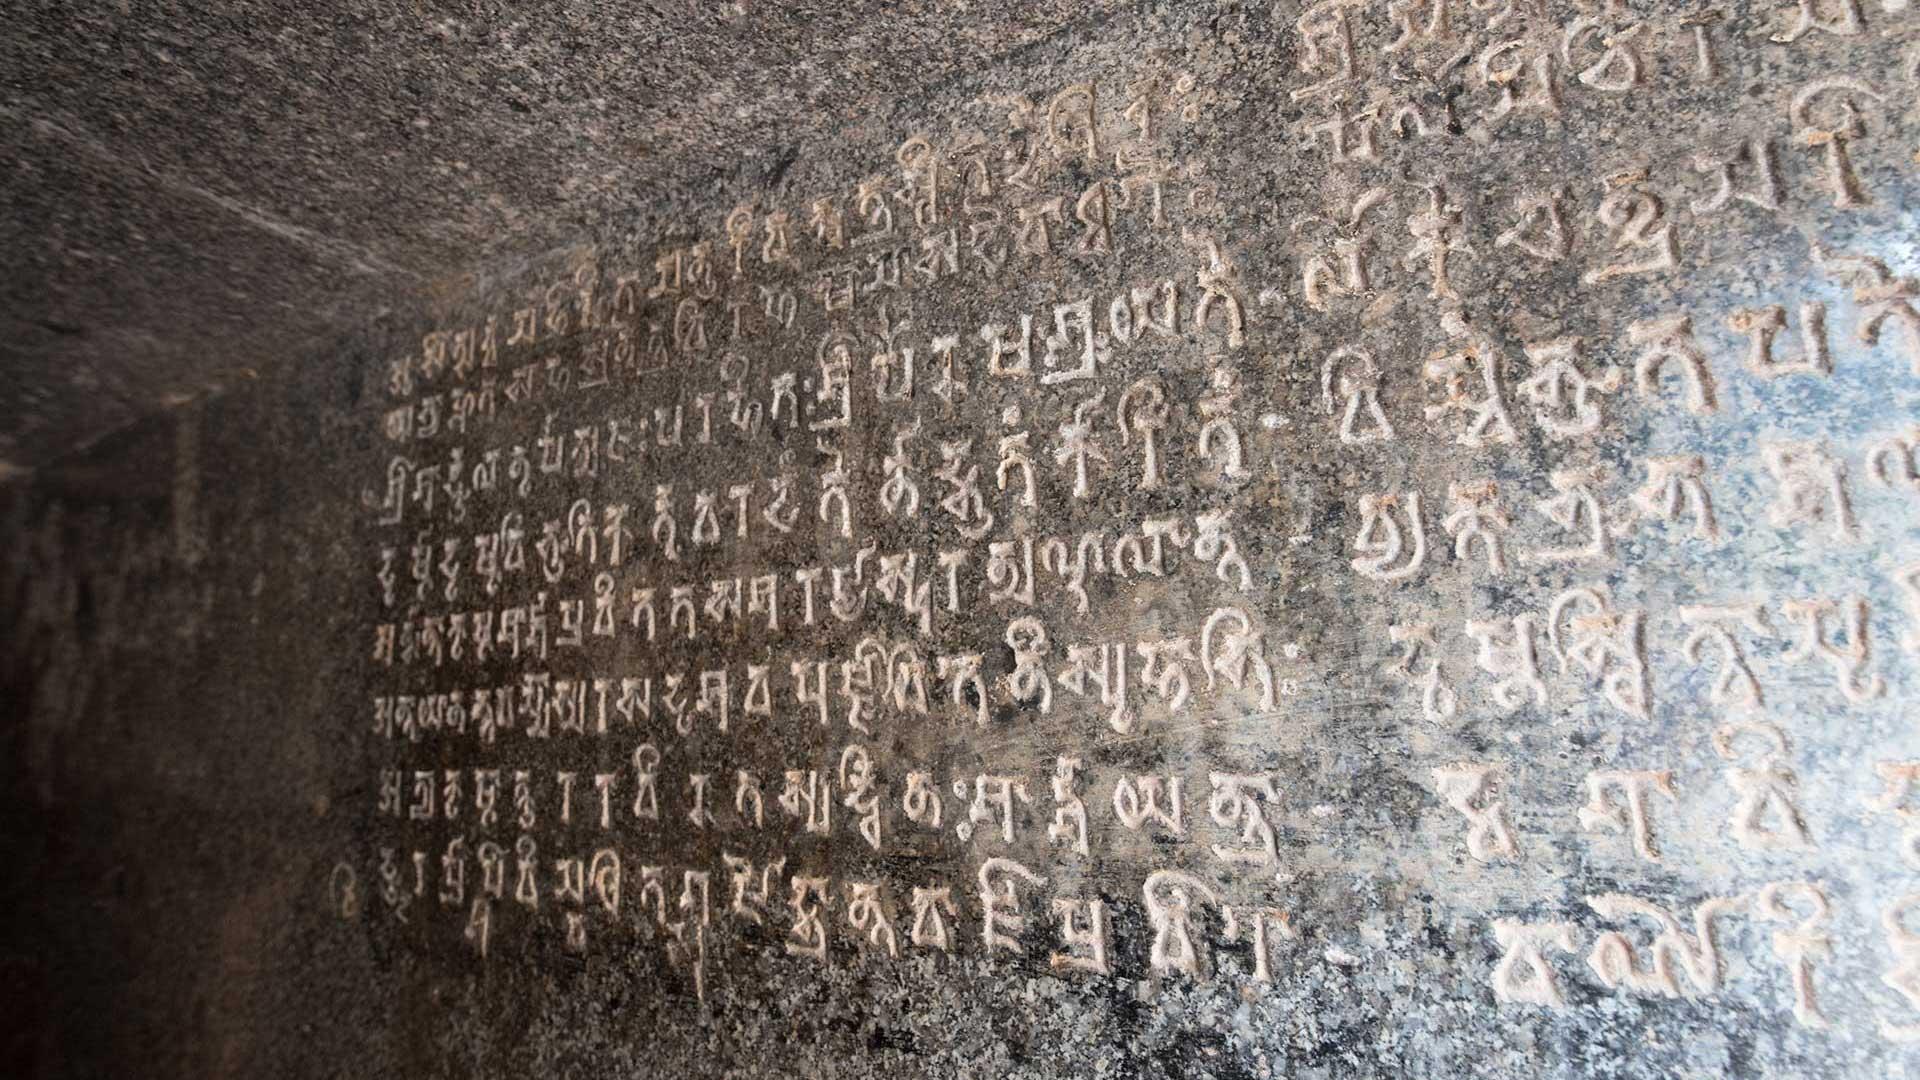 Barabar-BAM-film-granit-miroir-pyramide-inde-yoga-archeologie-livre-11b